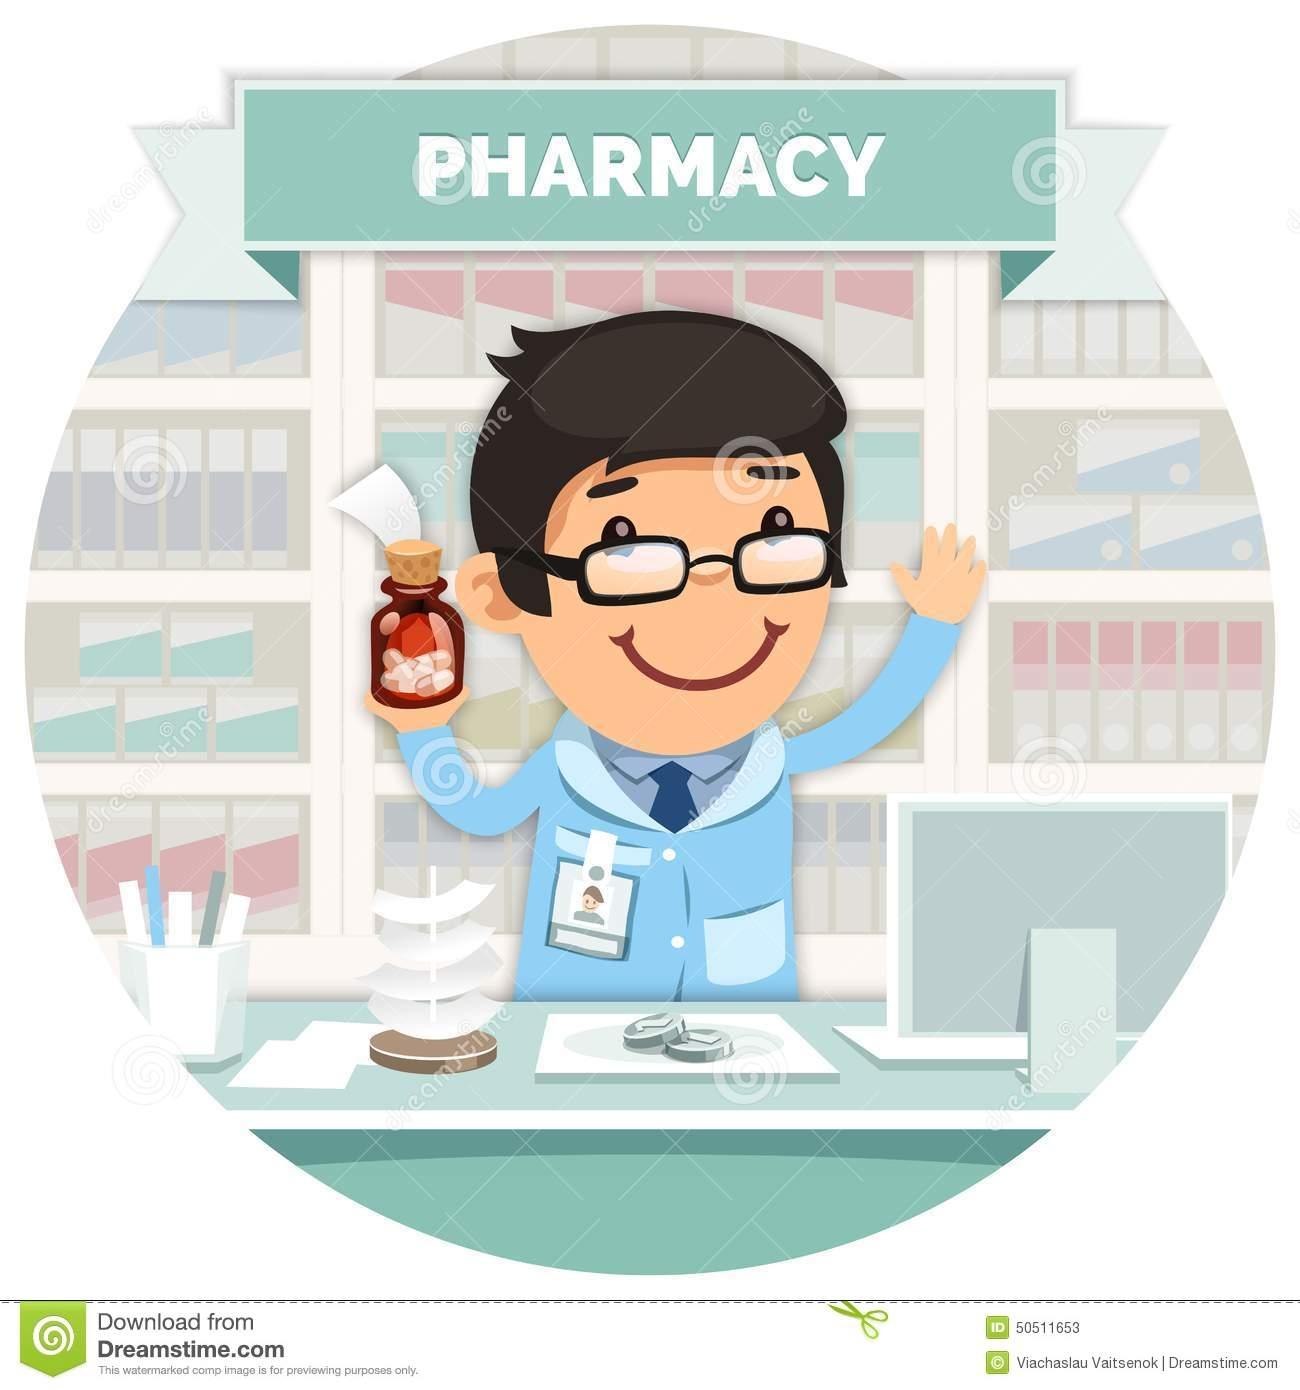 Awesome pharmacist design digital. Pharmacy clipart